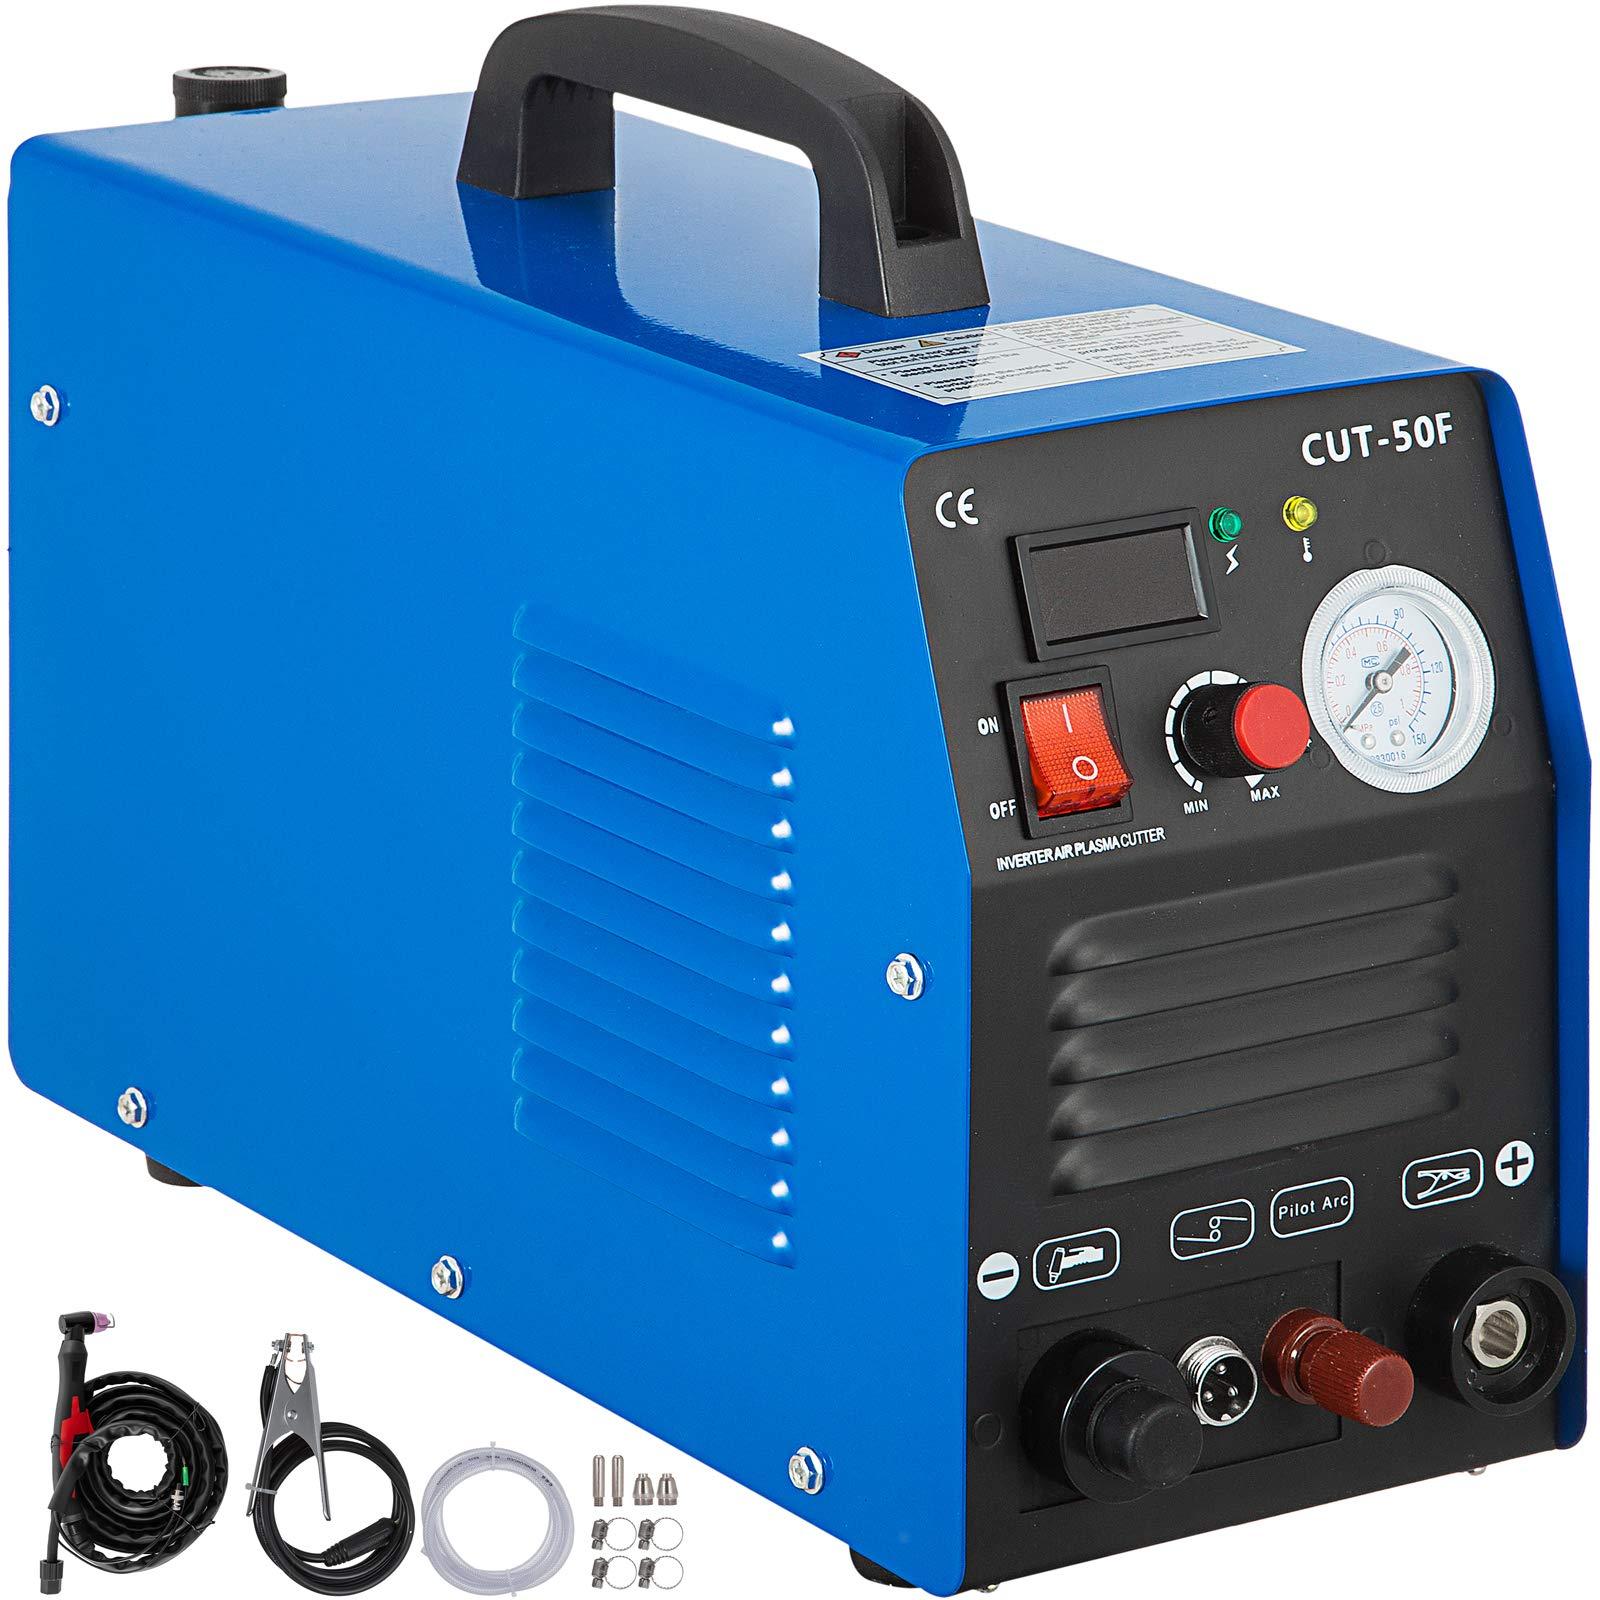 Mophorn 50 Amp Plasma Cutter Non-Touch Pilot Arc Dual Voltage 110 220V Plasma Cutting Machine 14mm(1/2 Inch) Cutting Thickness Portable Plasma Welder IGBT Inverter Digital Plasma Welding Machine